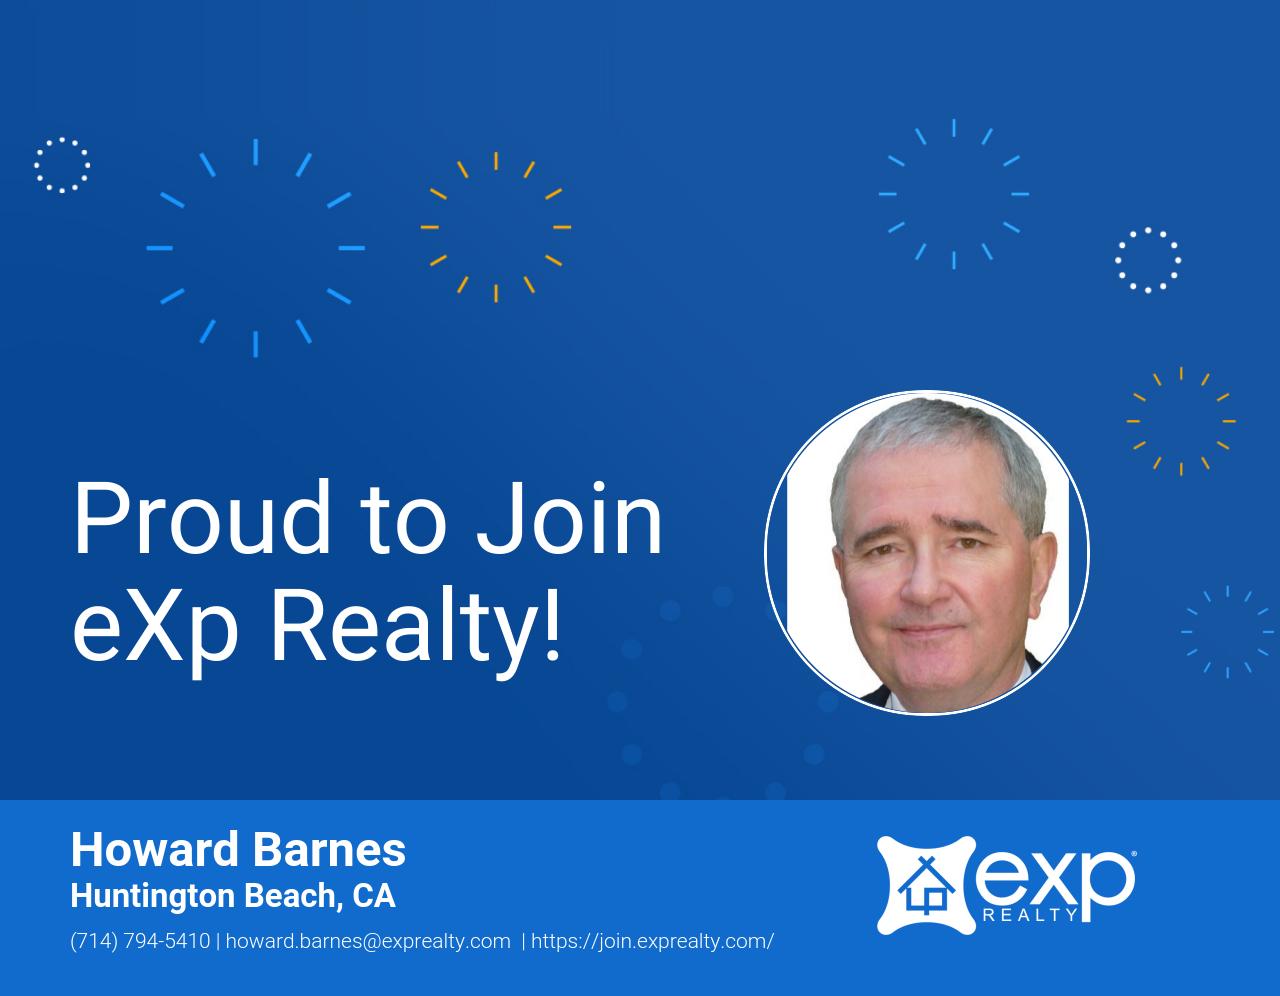 eXp Realty Welcomes Howard Barnes!